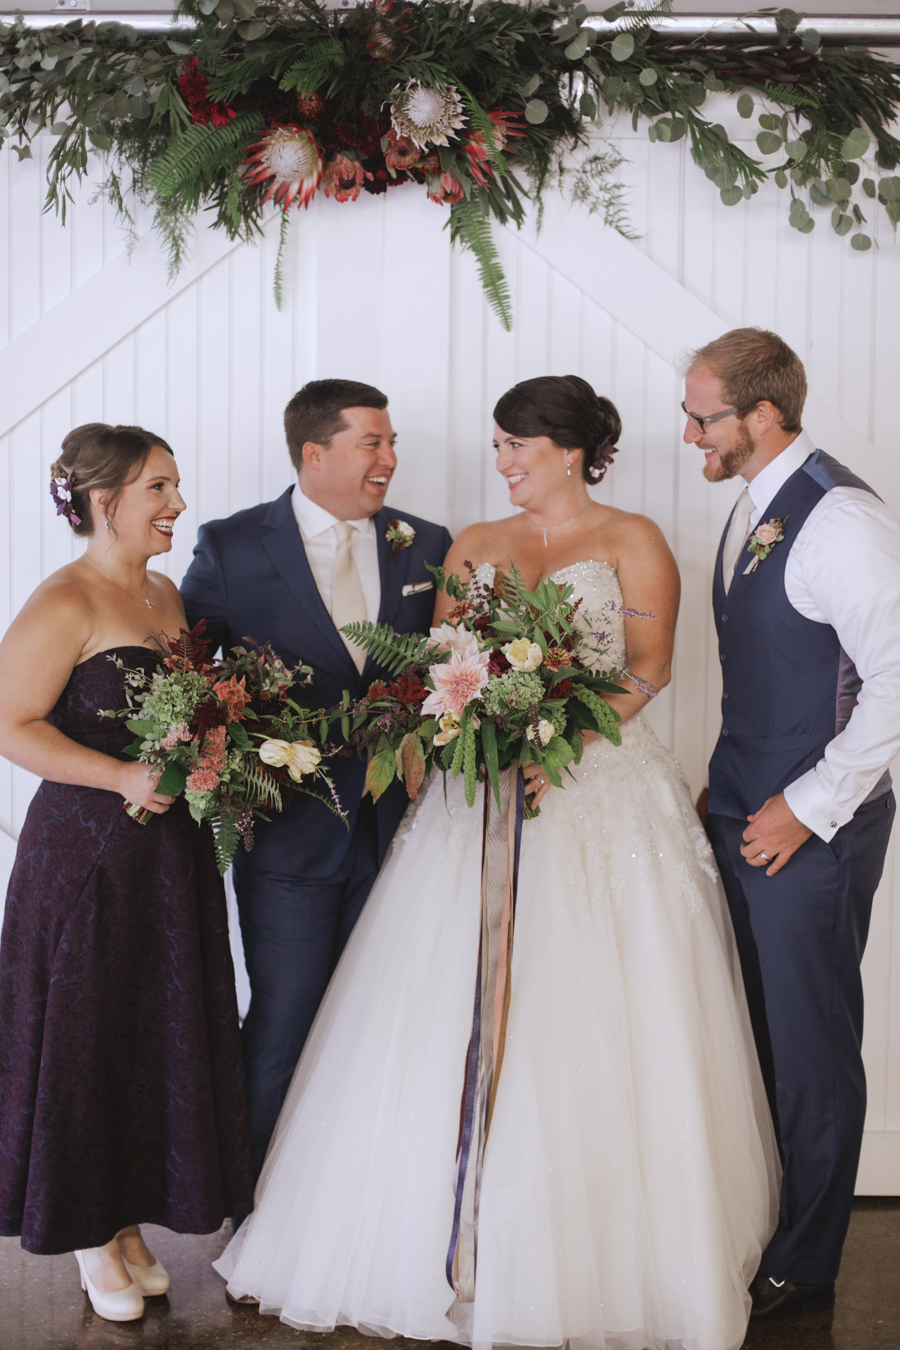 Rustic Woodland Chic Wedding Inspiration in Baltimore - https://ruffledblog.com/rustic-woodland-chic-wedding-inspiration-in-baltimore